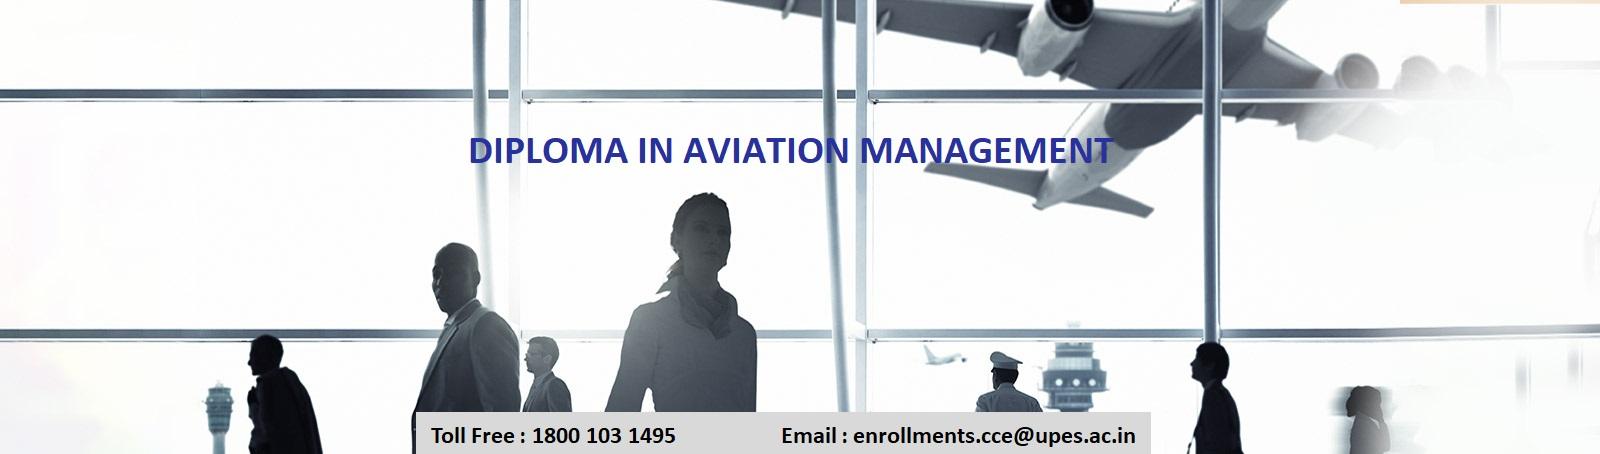 Diploma in Aviation